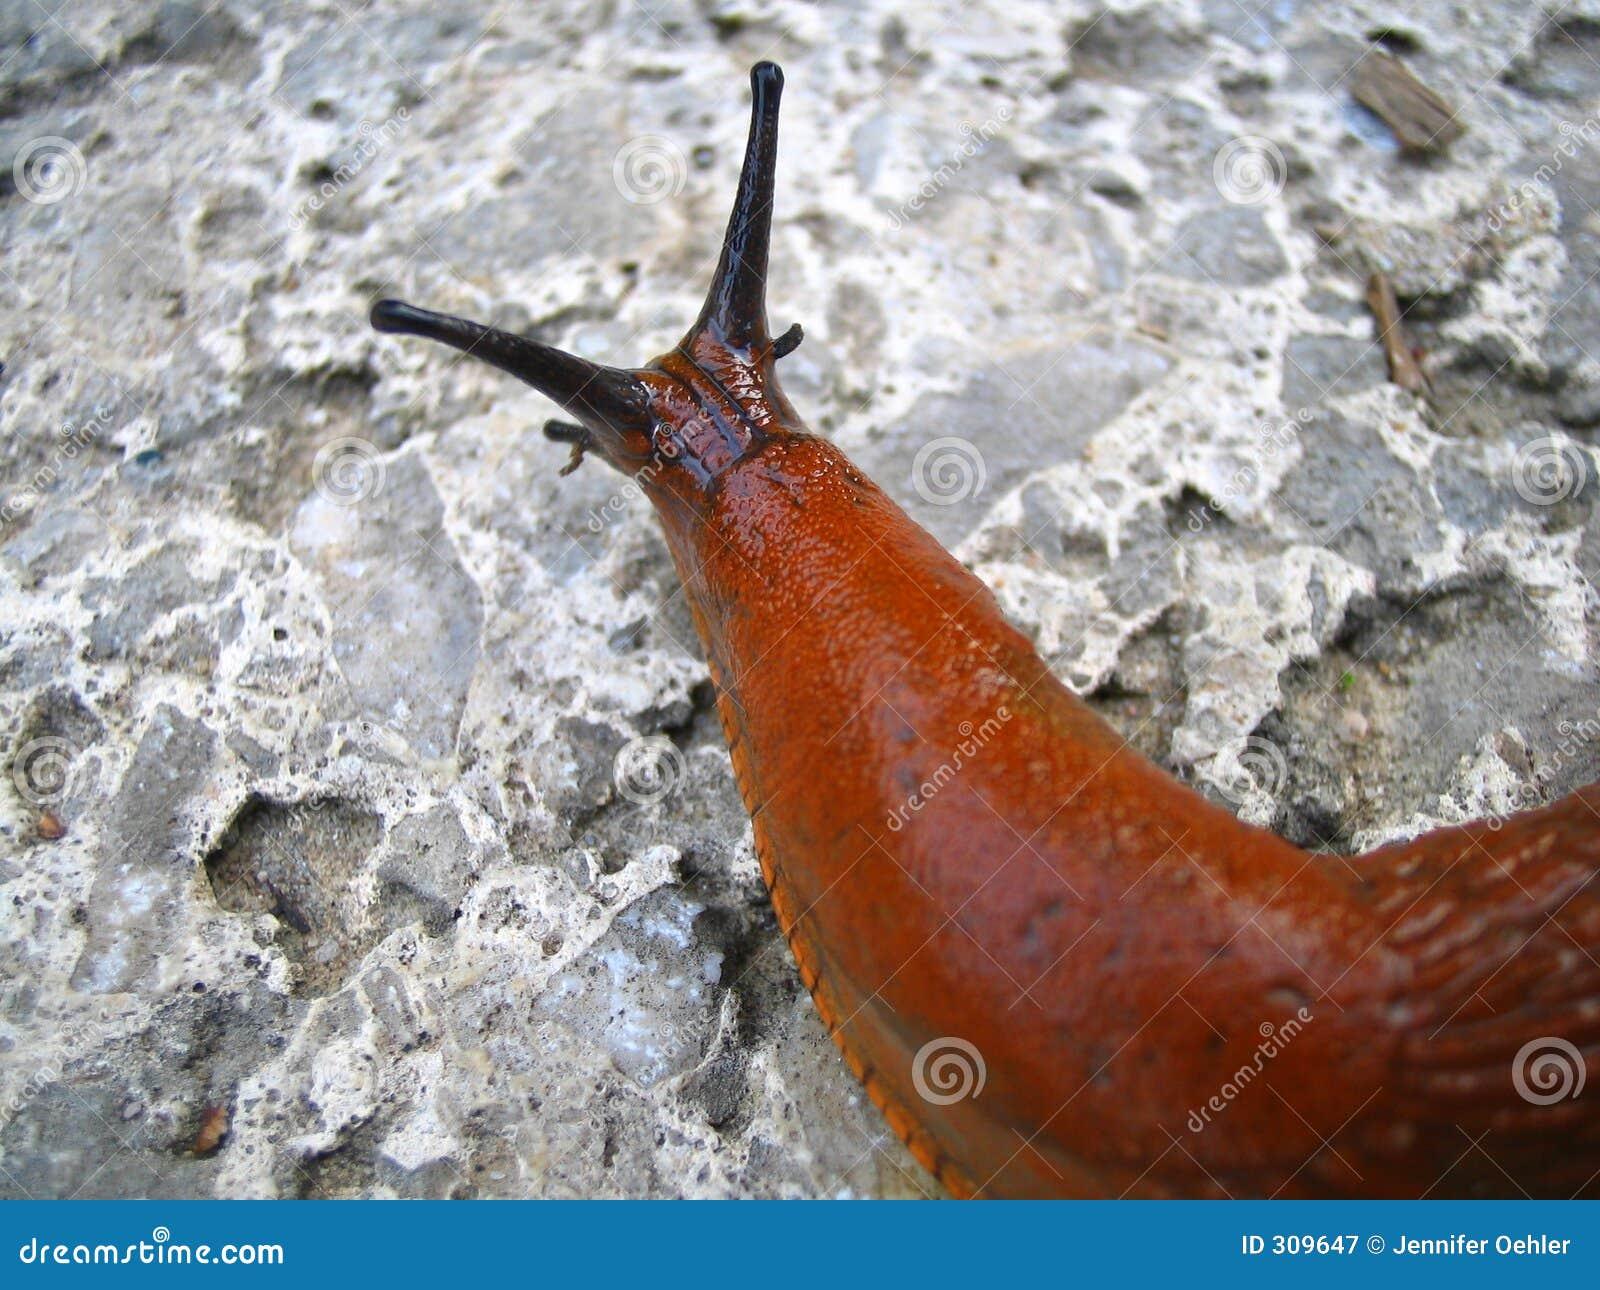 141 best Snails - Slugs images on Pinterest   Snails, Animals and ...